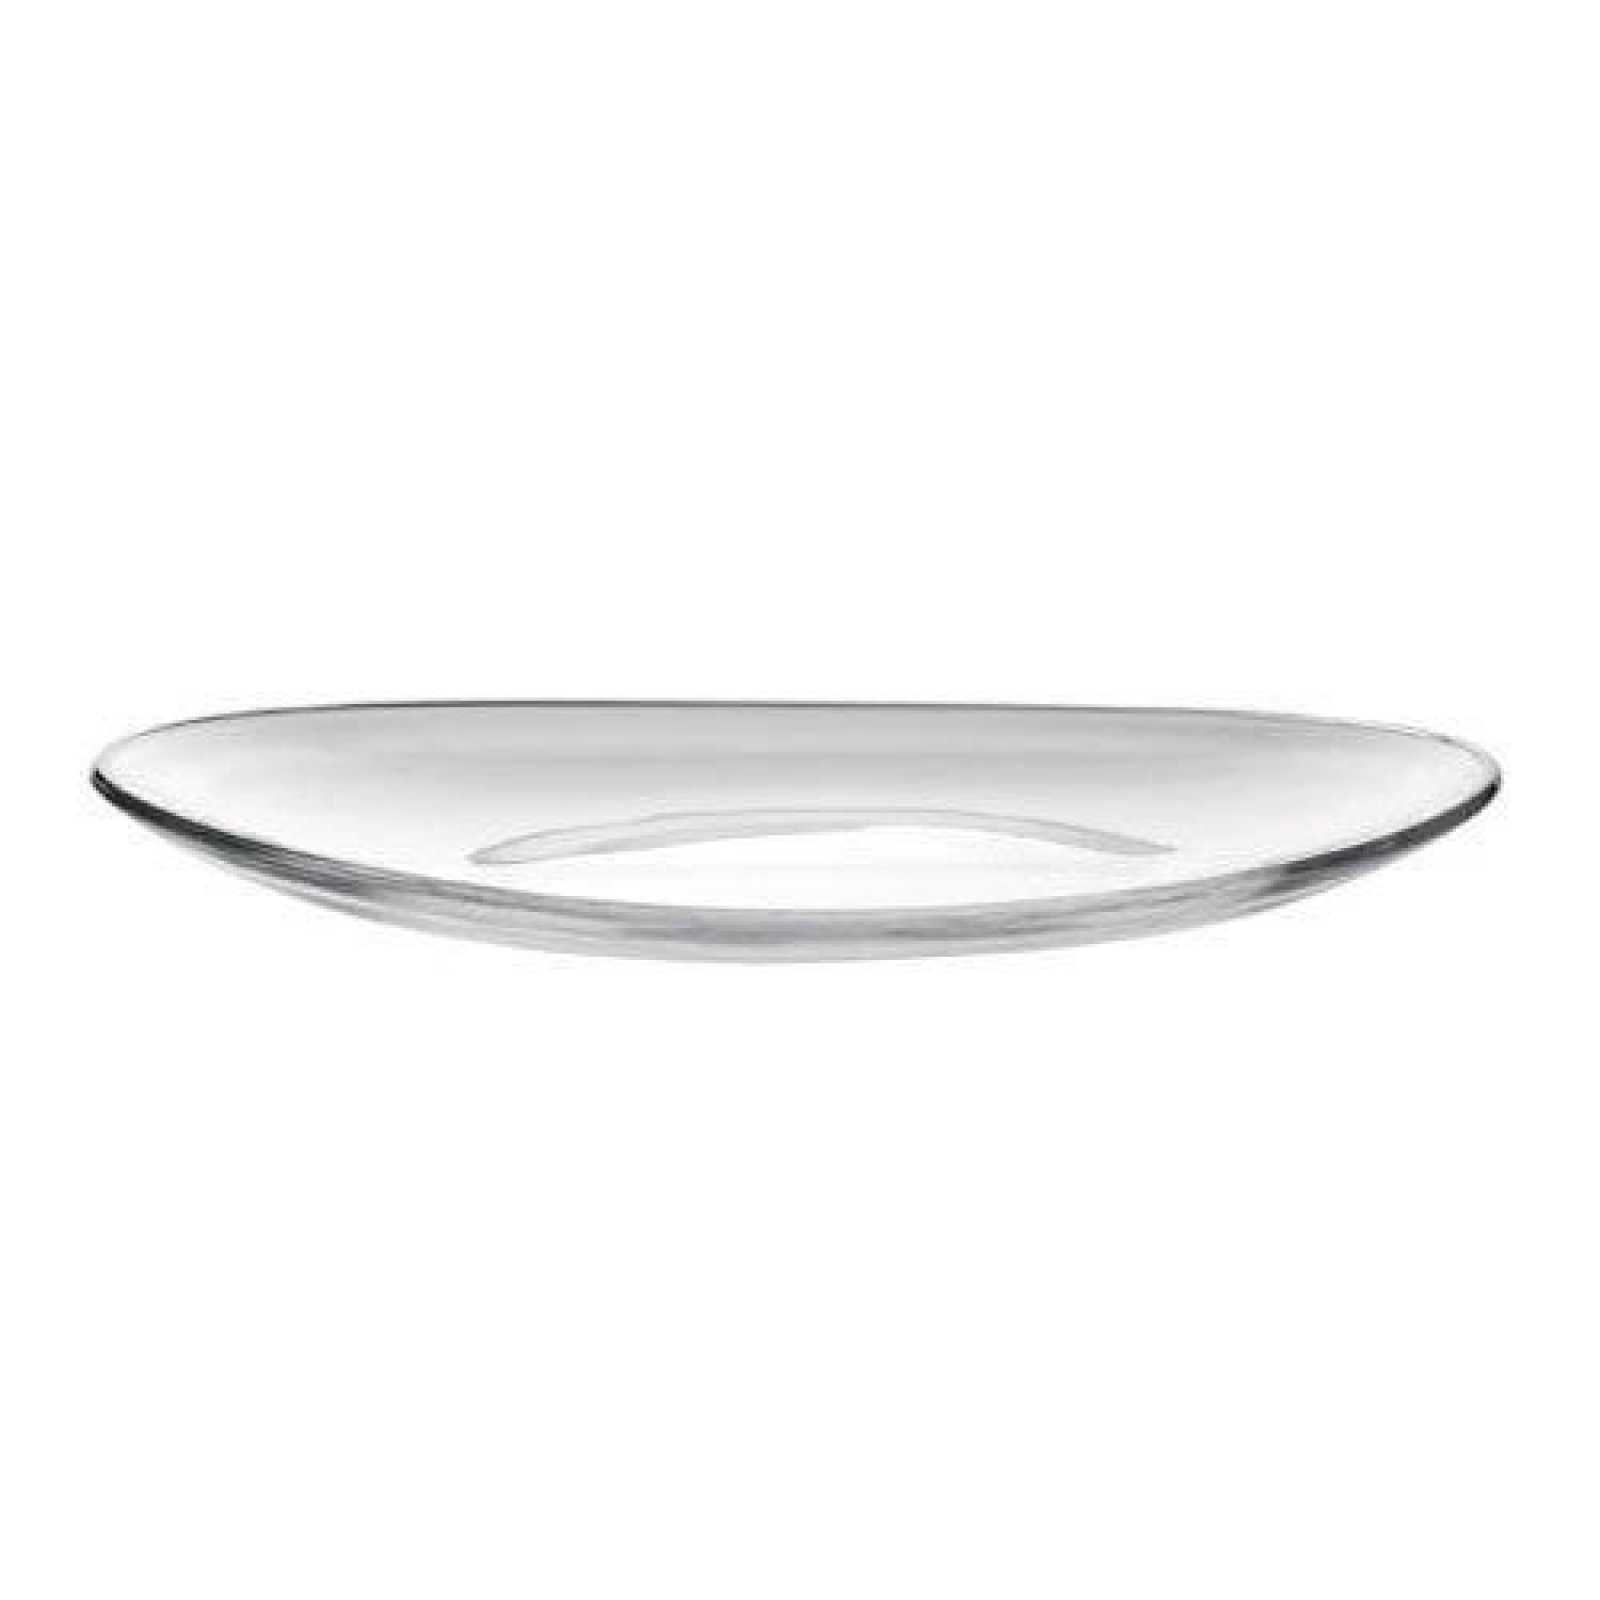 Онлайн каталог PROMENU: Блюдо сервировочное Schott Zwiesel ARRONDI, длина 35 см, прозрачный Schott Zwiesel 114682